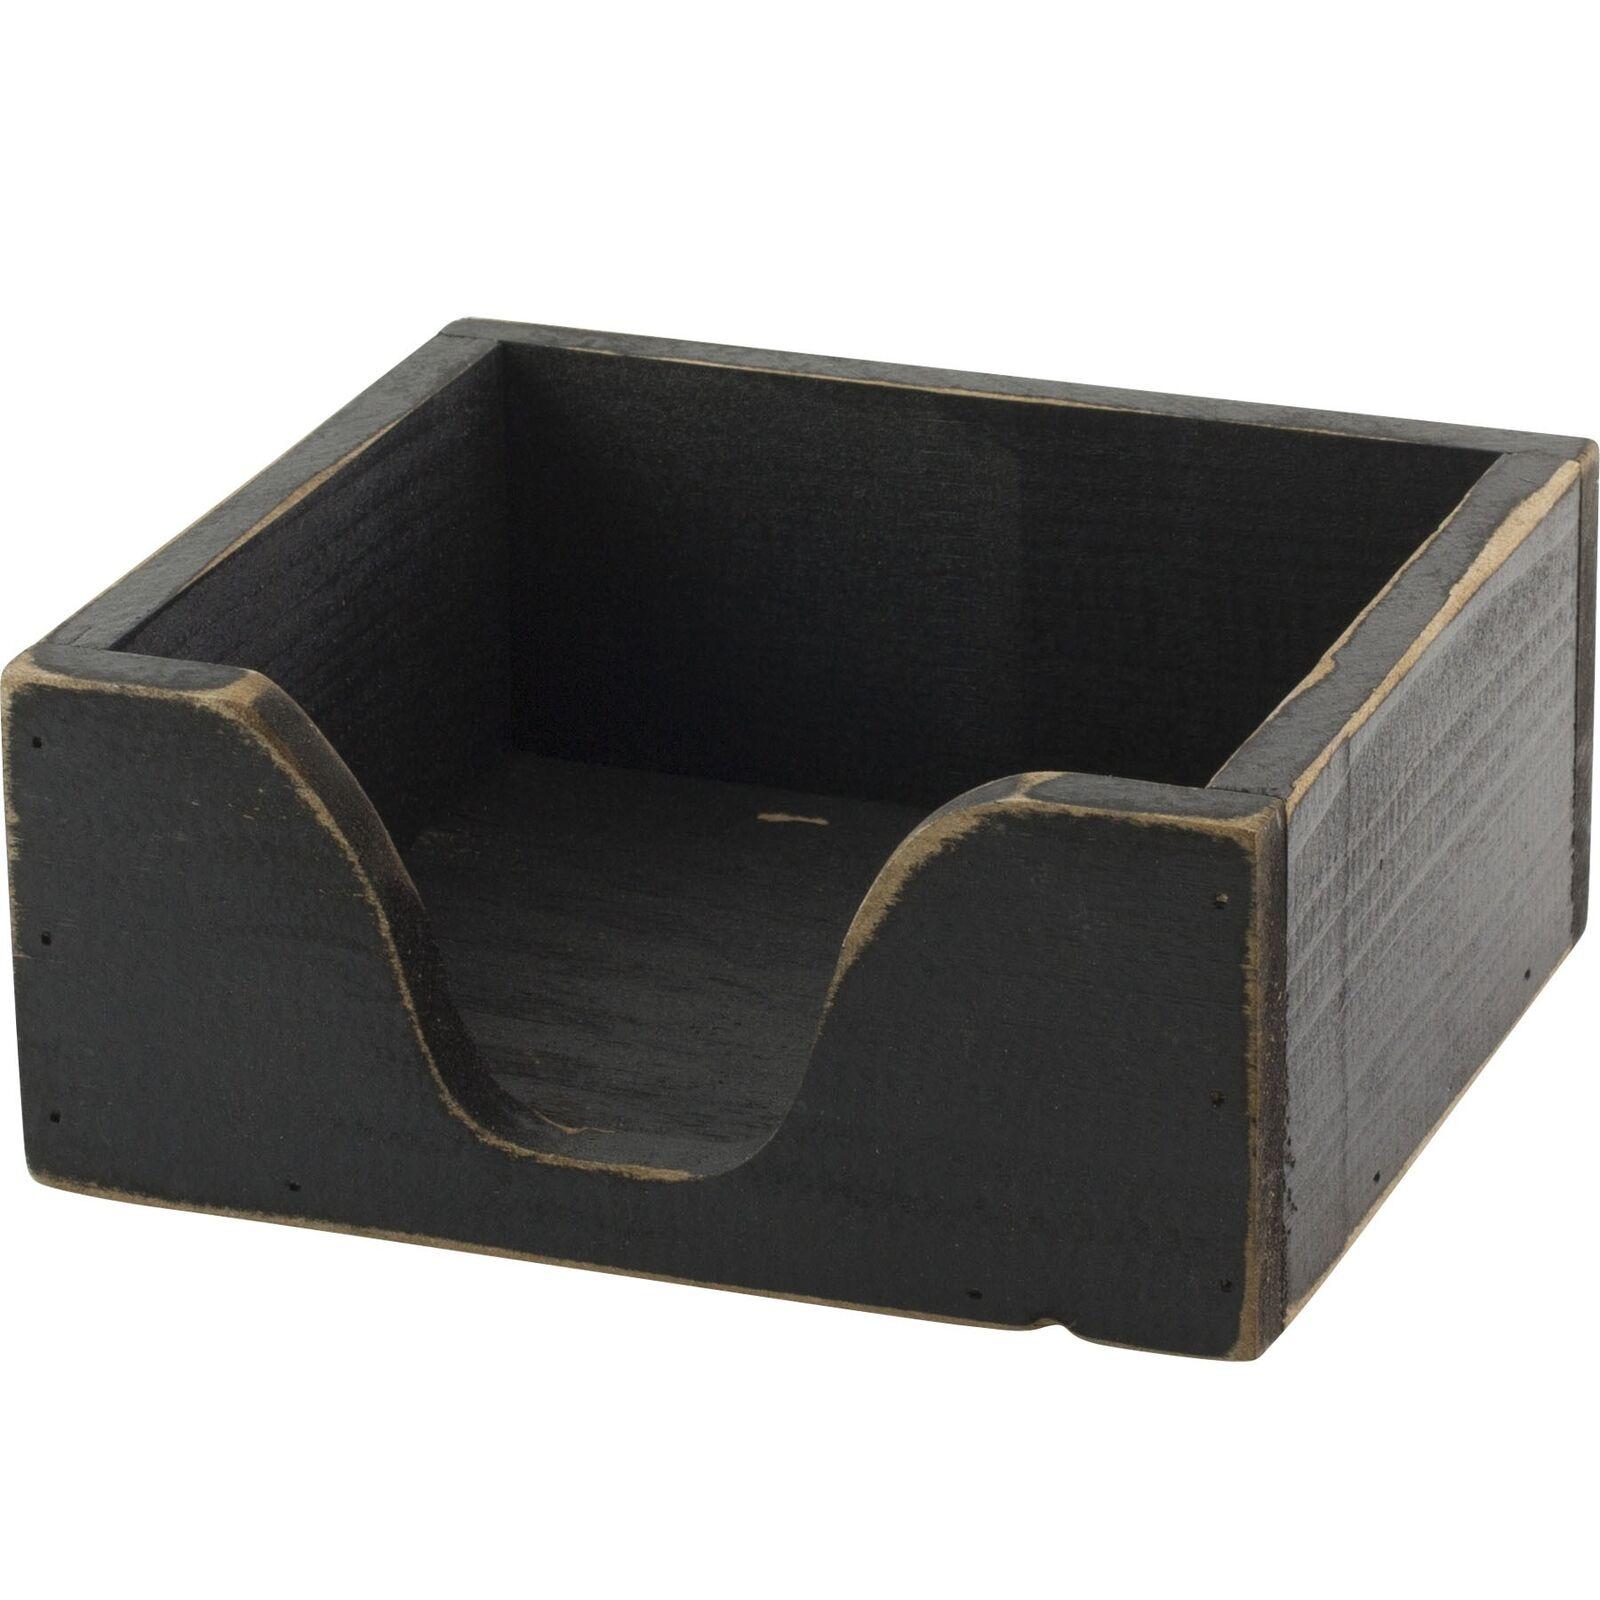 Details About Primitive Black Wood Box Napkin Holder Farmhouse Rustic Country Decor